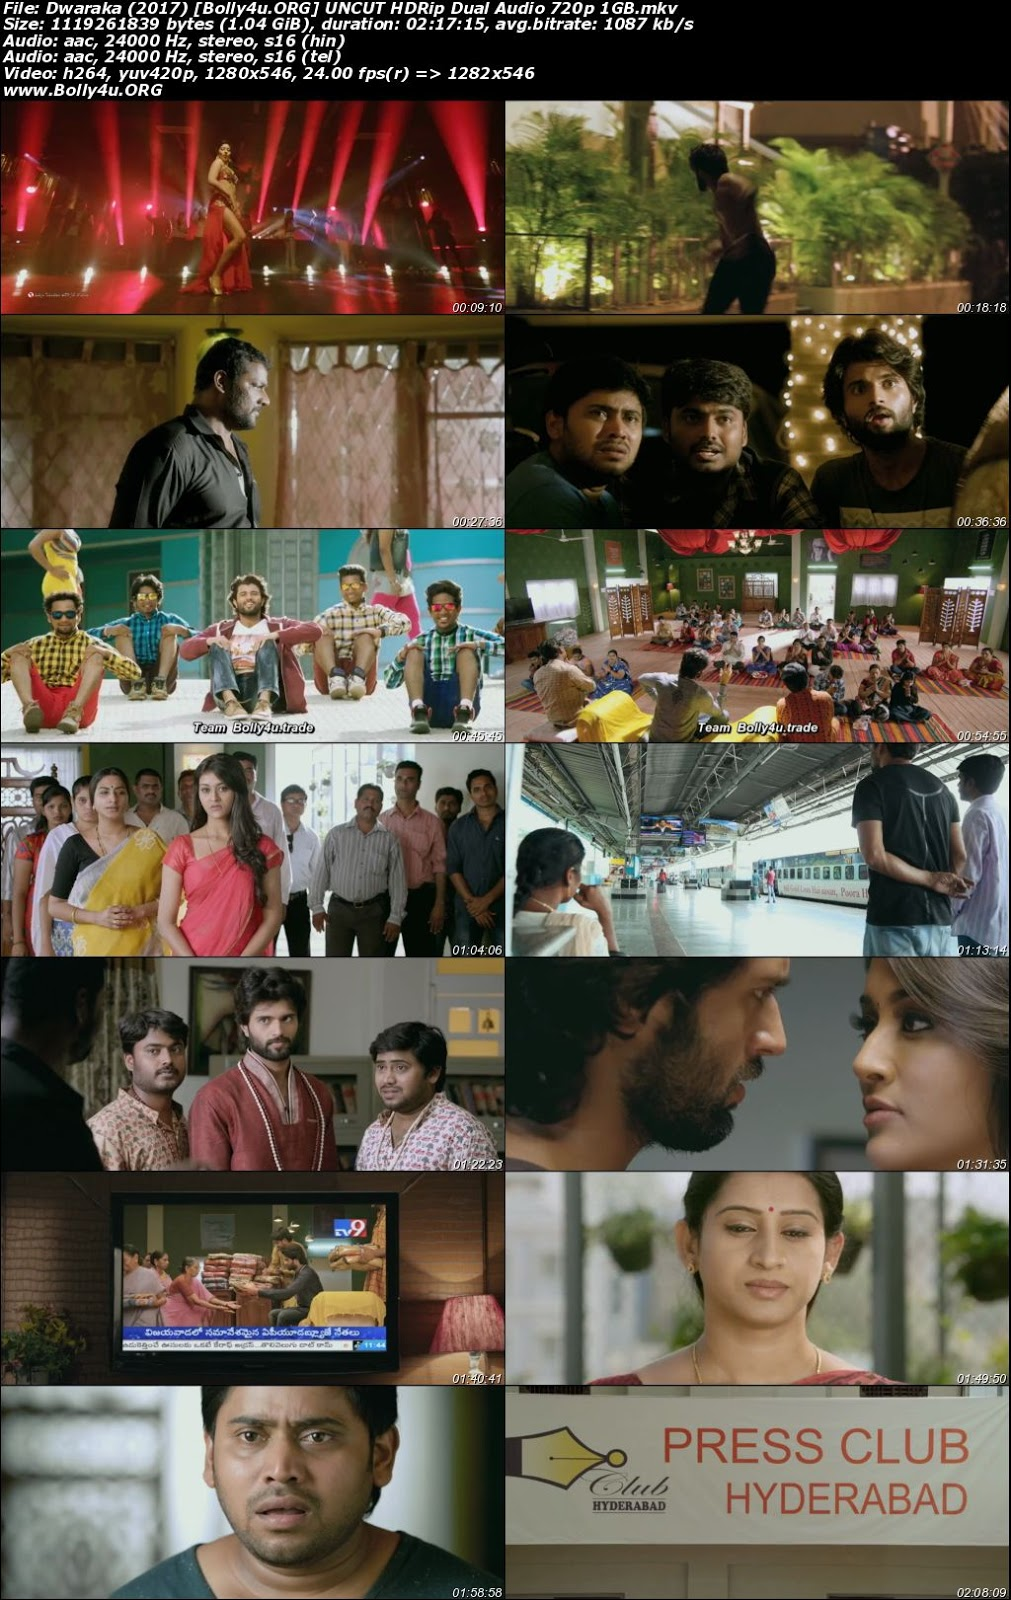 Dwaraka 2017 HDRip 400MB UNCUT Hindi Dual Audio 480p Download